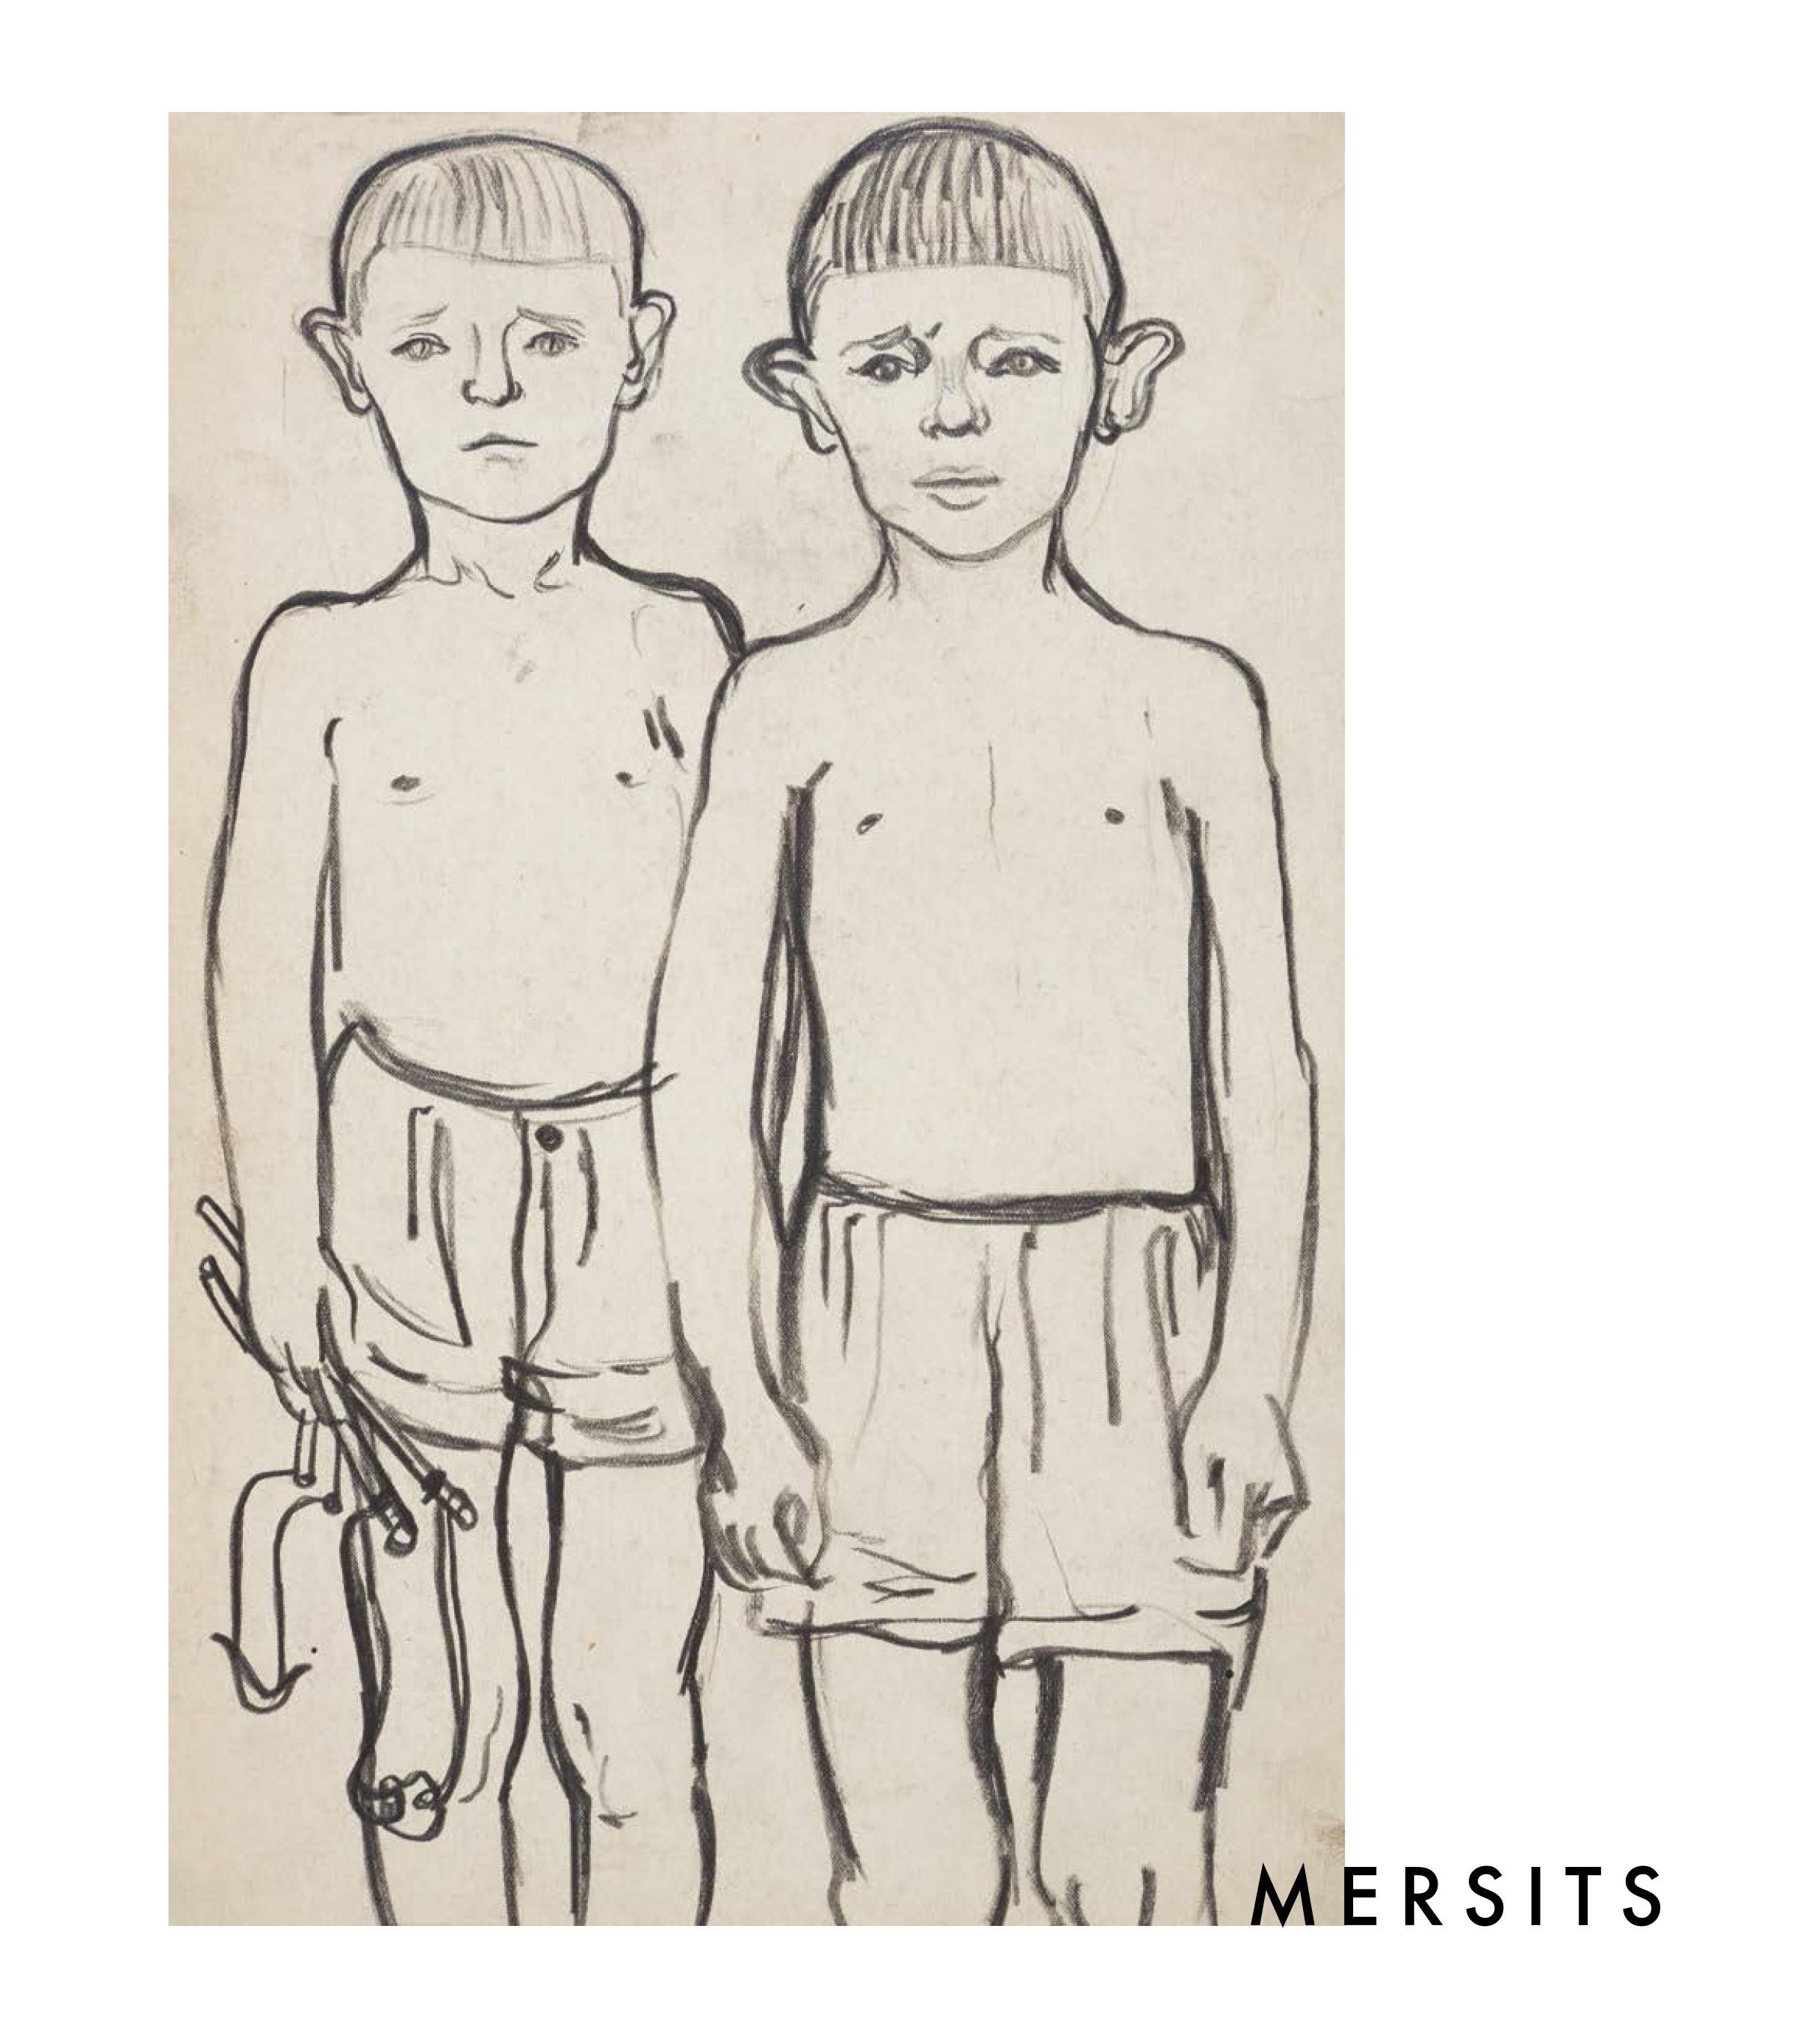 MERSITS PIROSKA